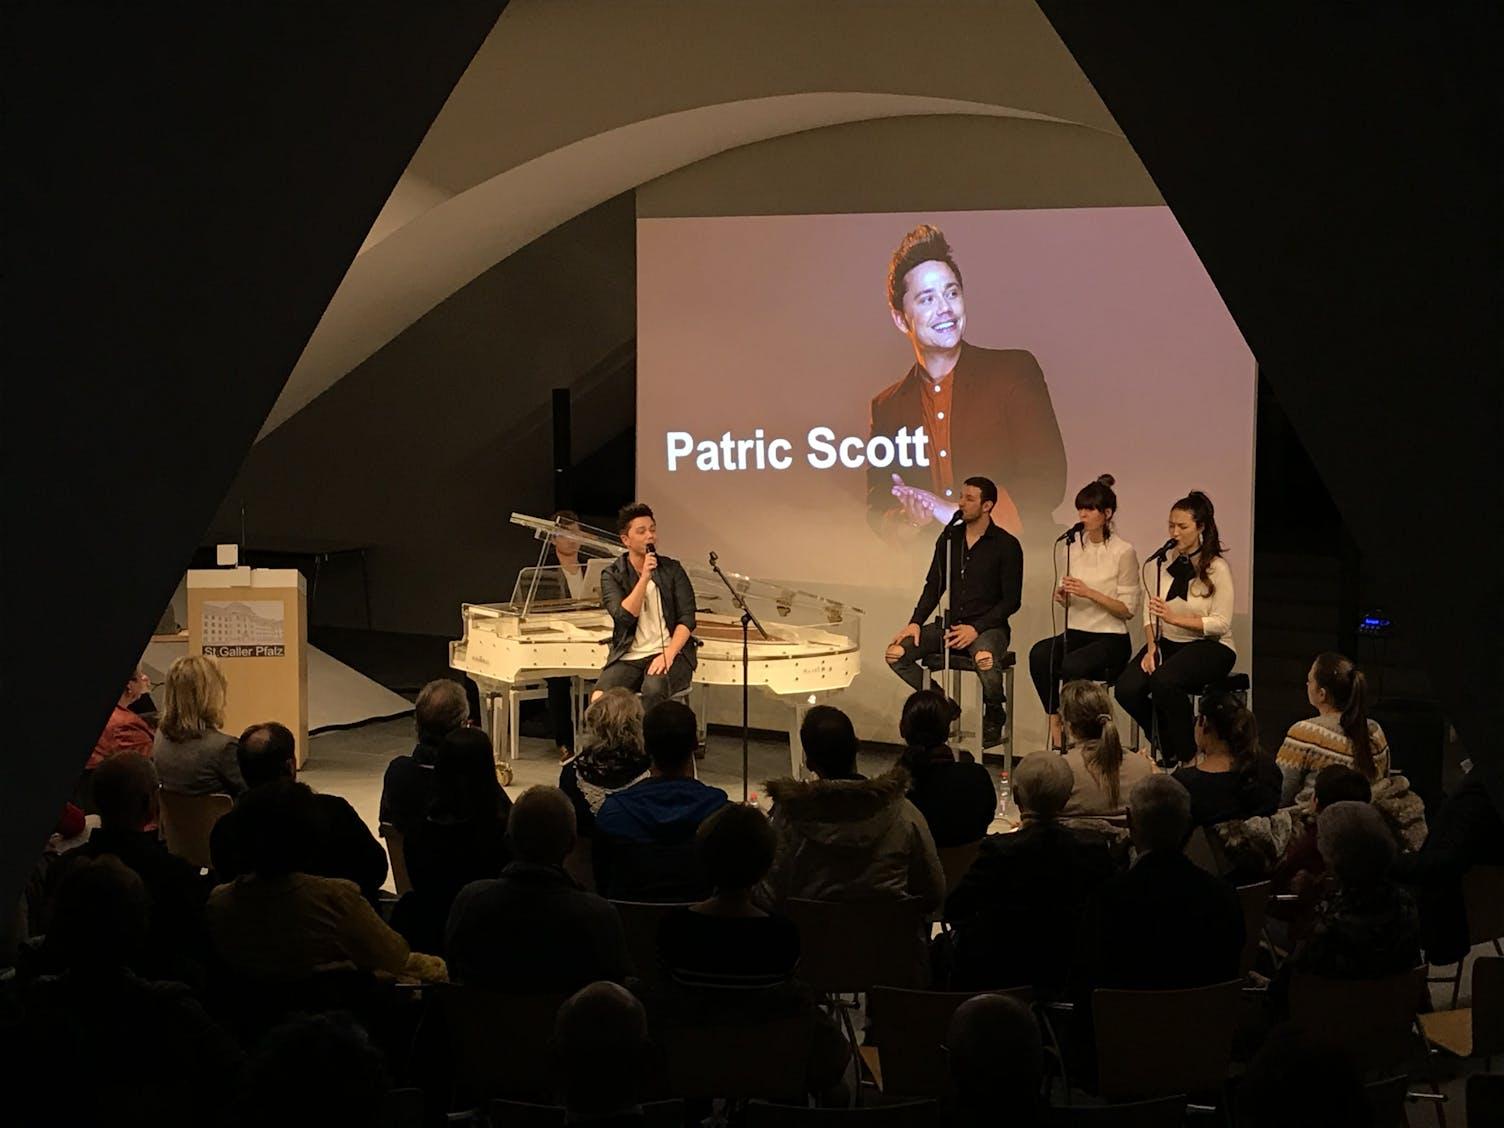 Patrick Scott